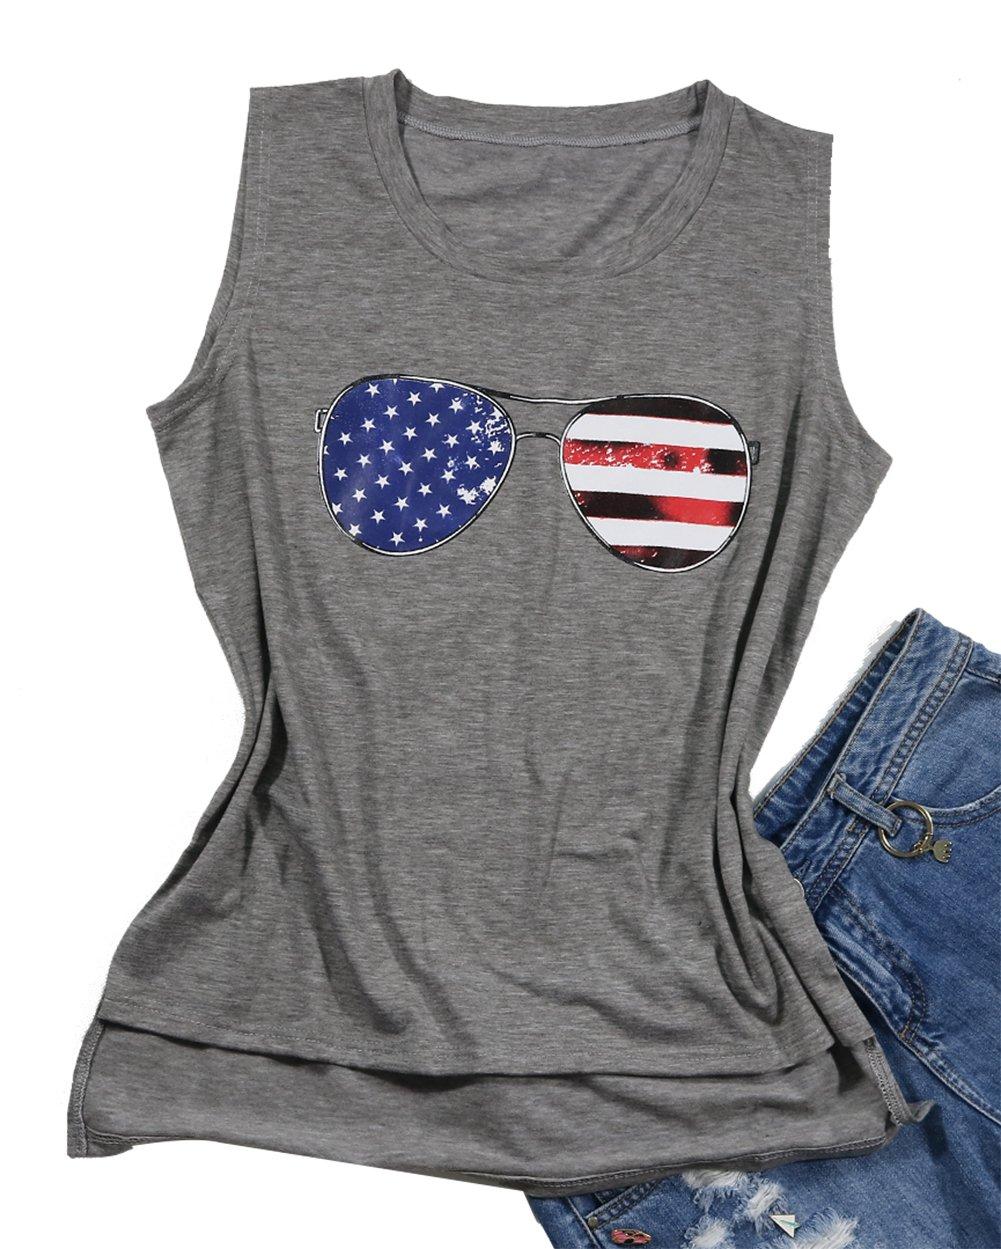 DUTUT Women's Summer Letter Print T-Shirt Sleeveless Funny Tank Tops Vest Size XL (Gray) by DUTUT (Image #1)